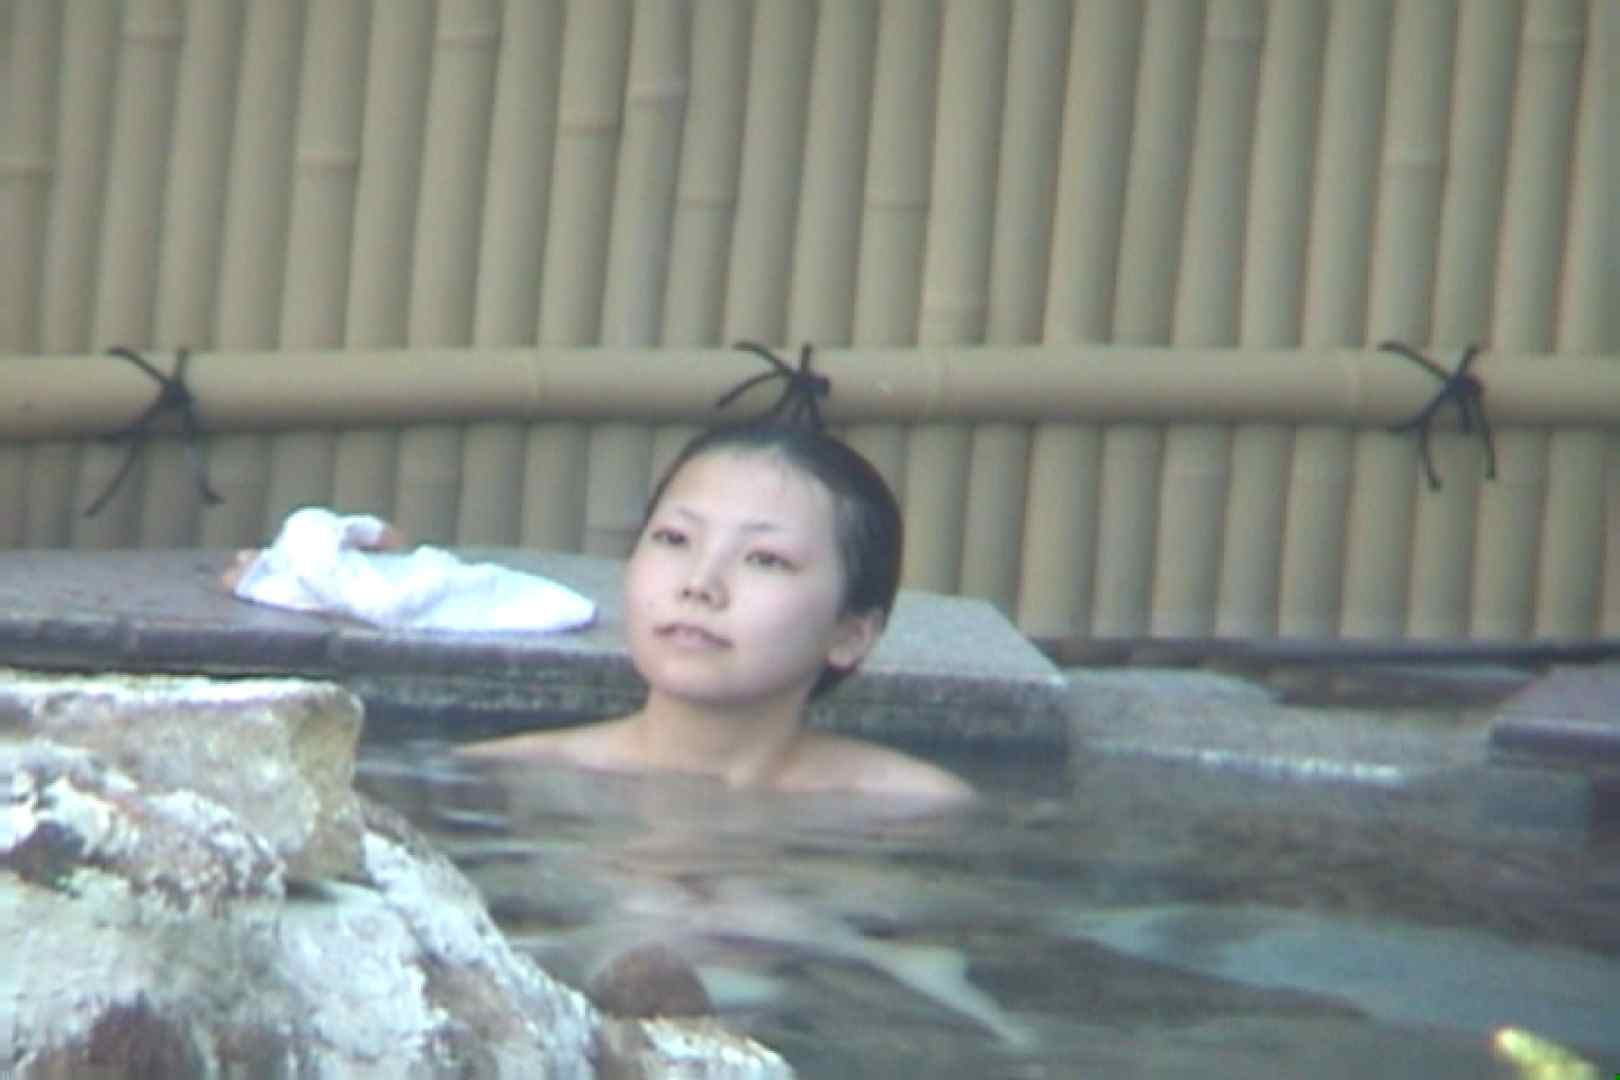 Aquaな露天風呂Vol.572 露天風呂編  93PIX 4